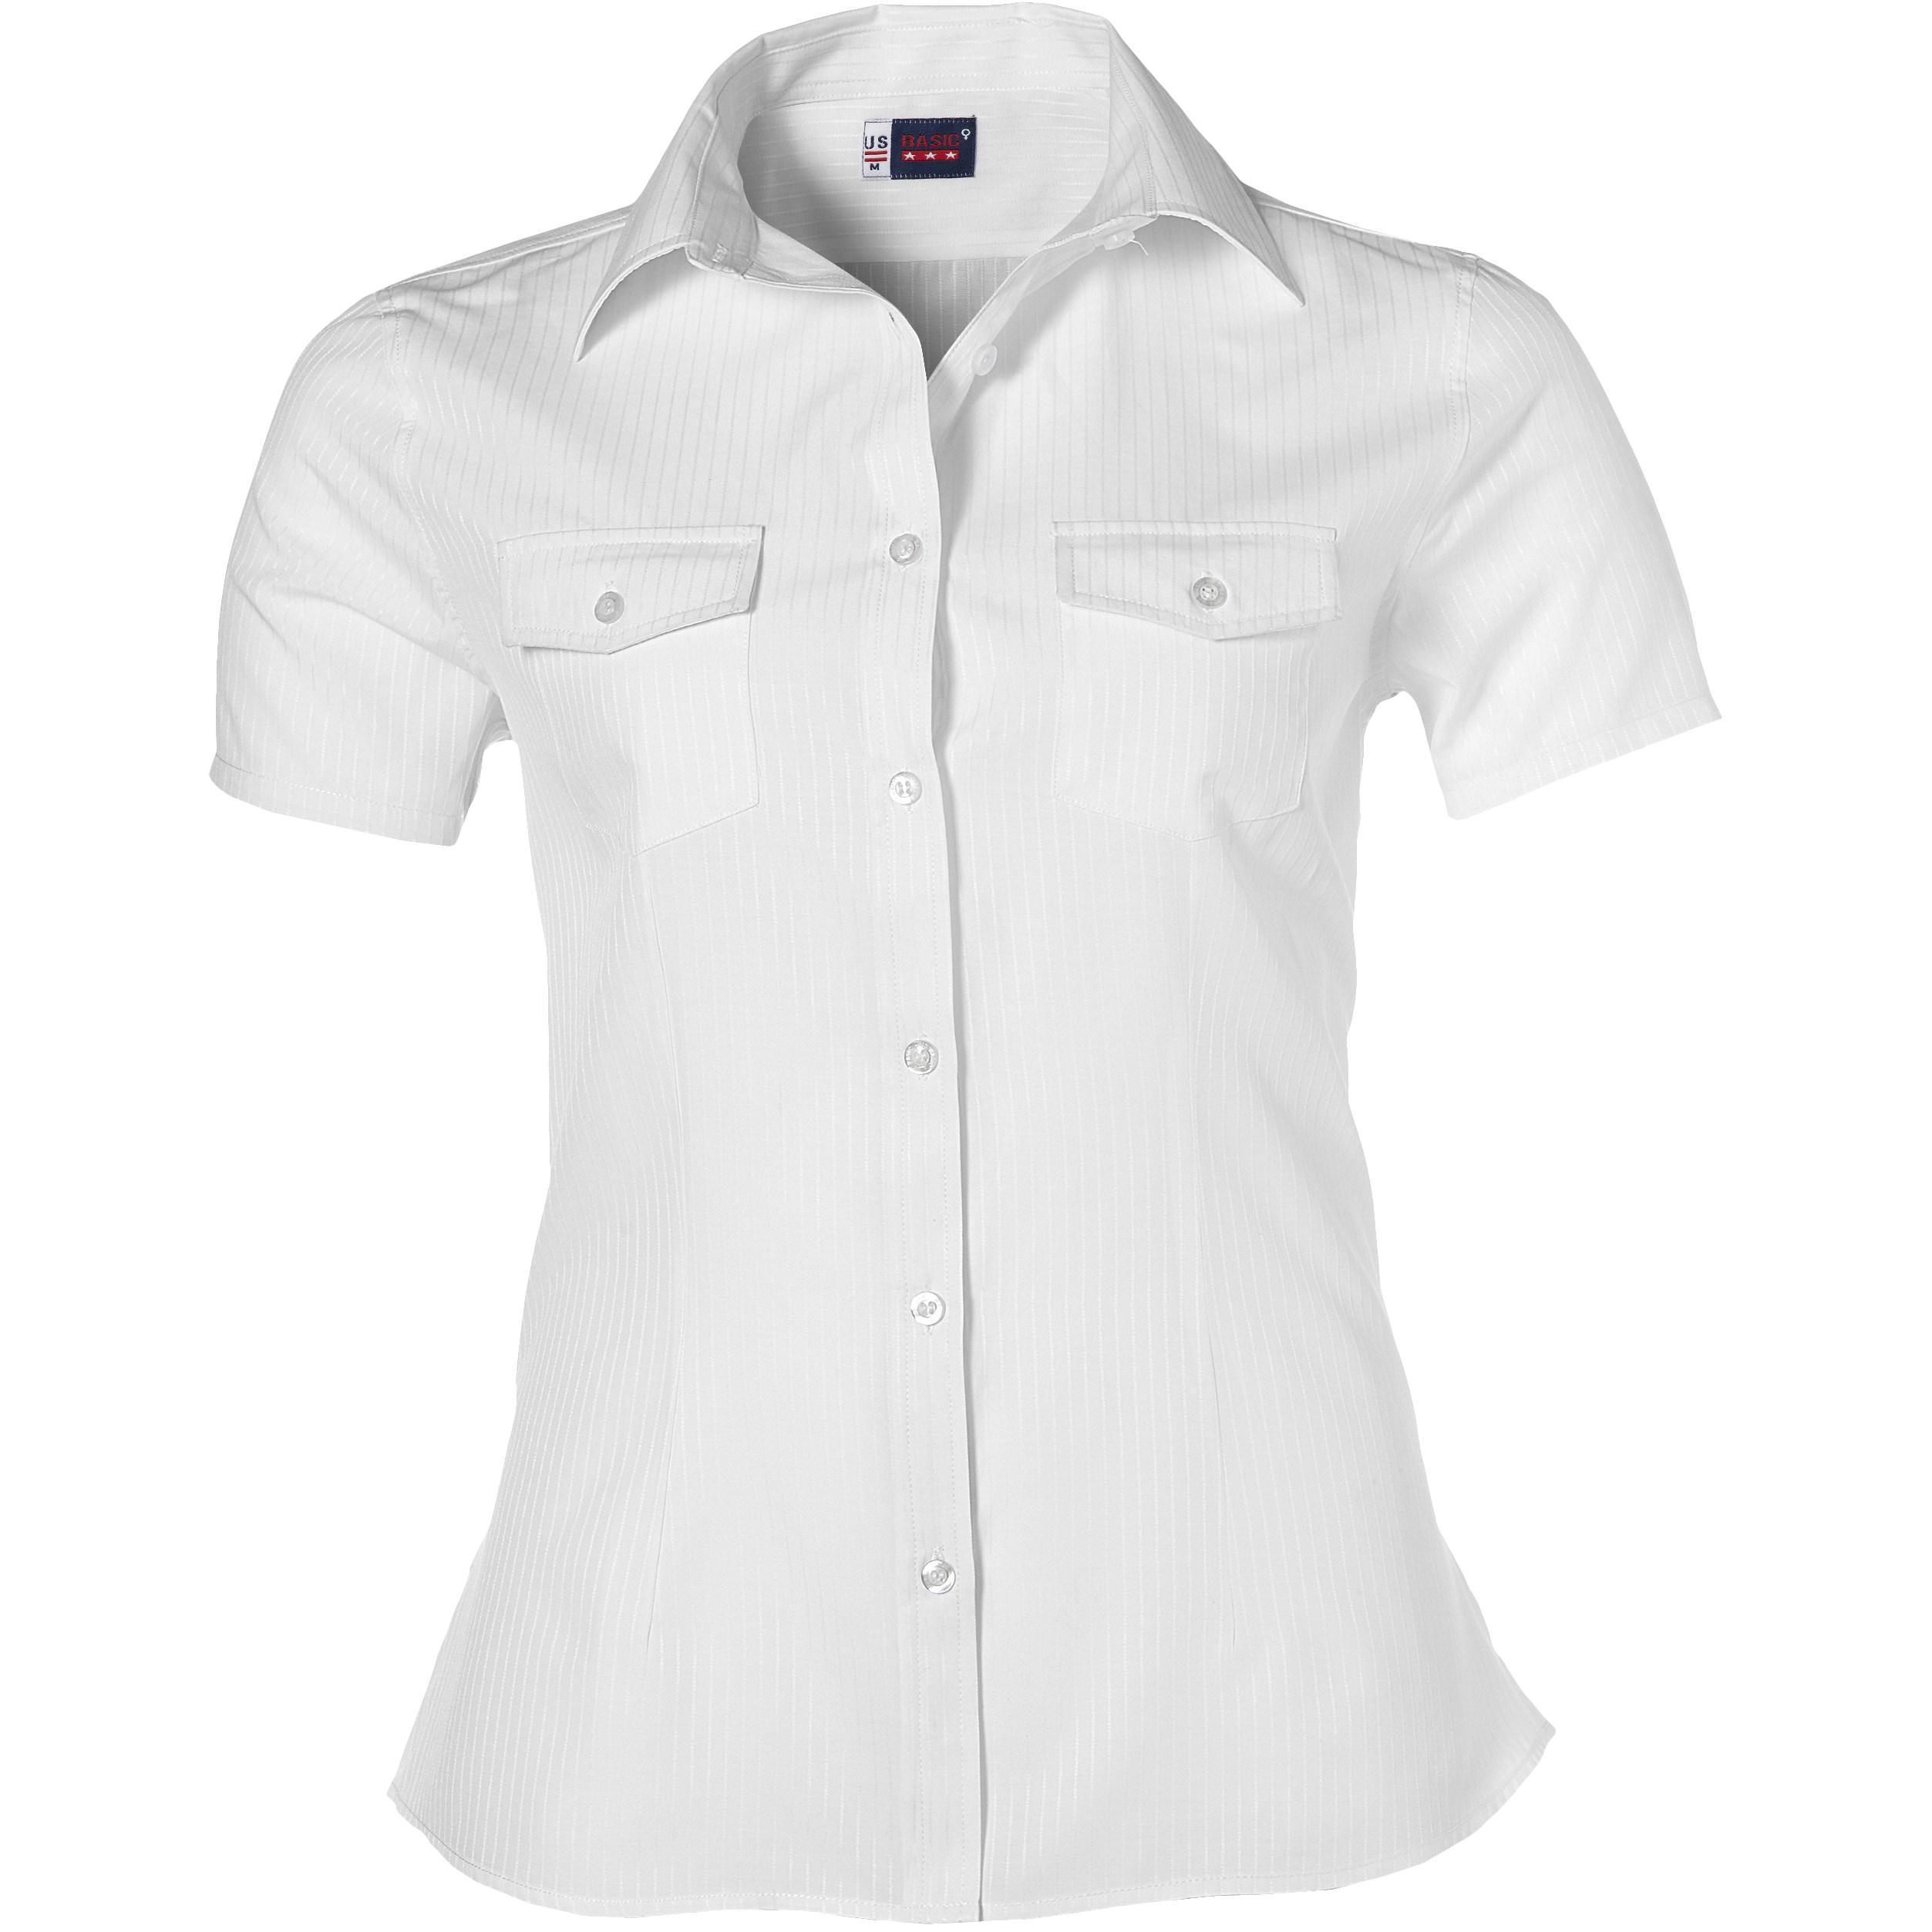 Ladies Short Sleeve Bayport Shirt -white Only